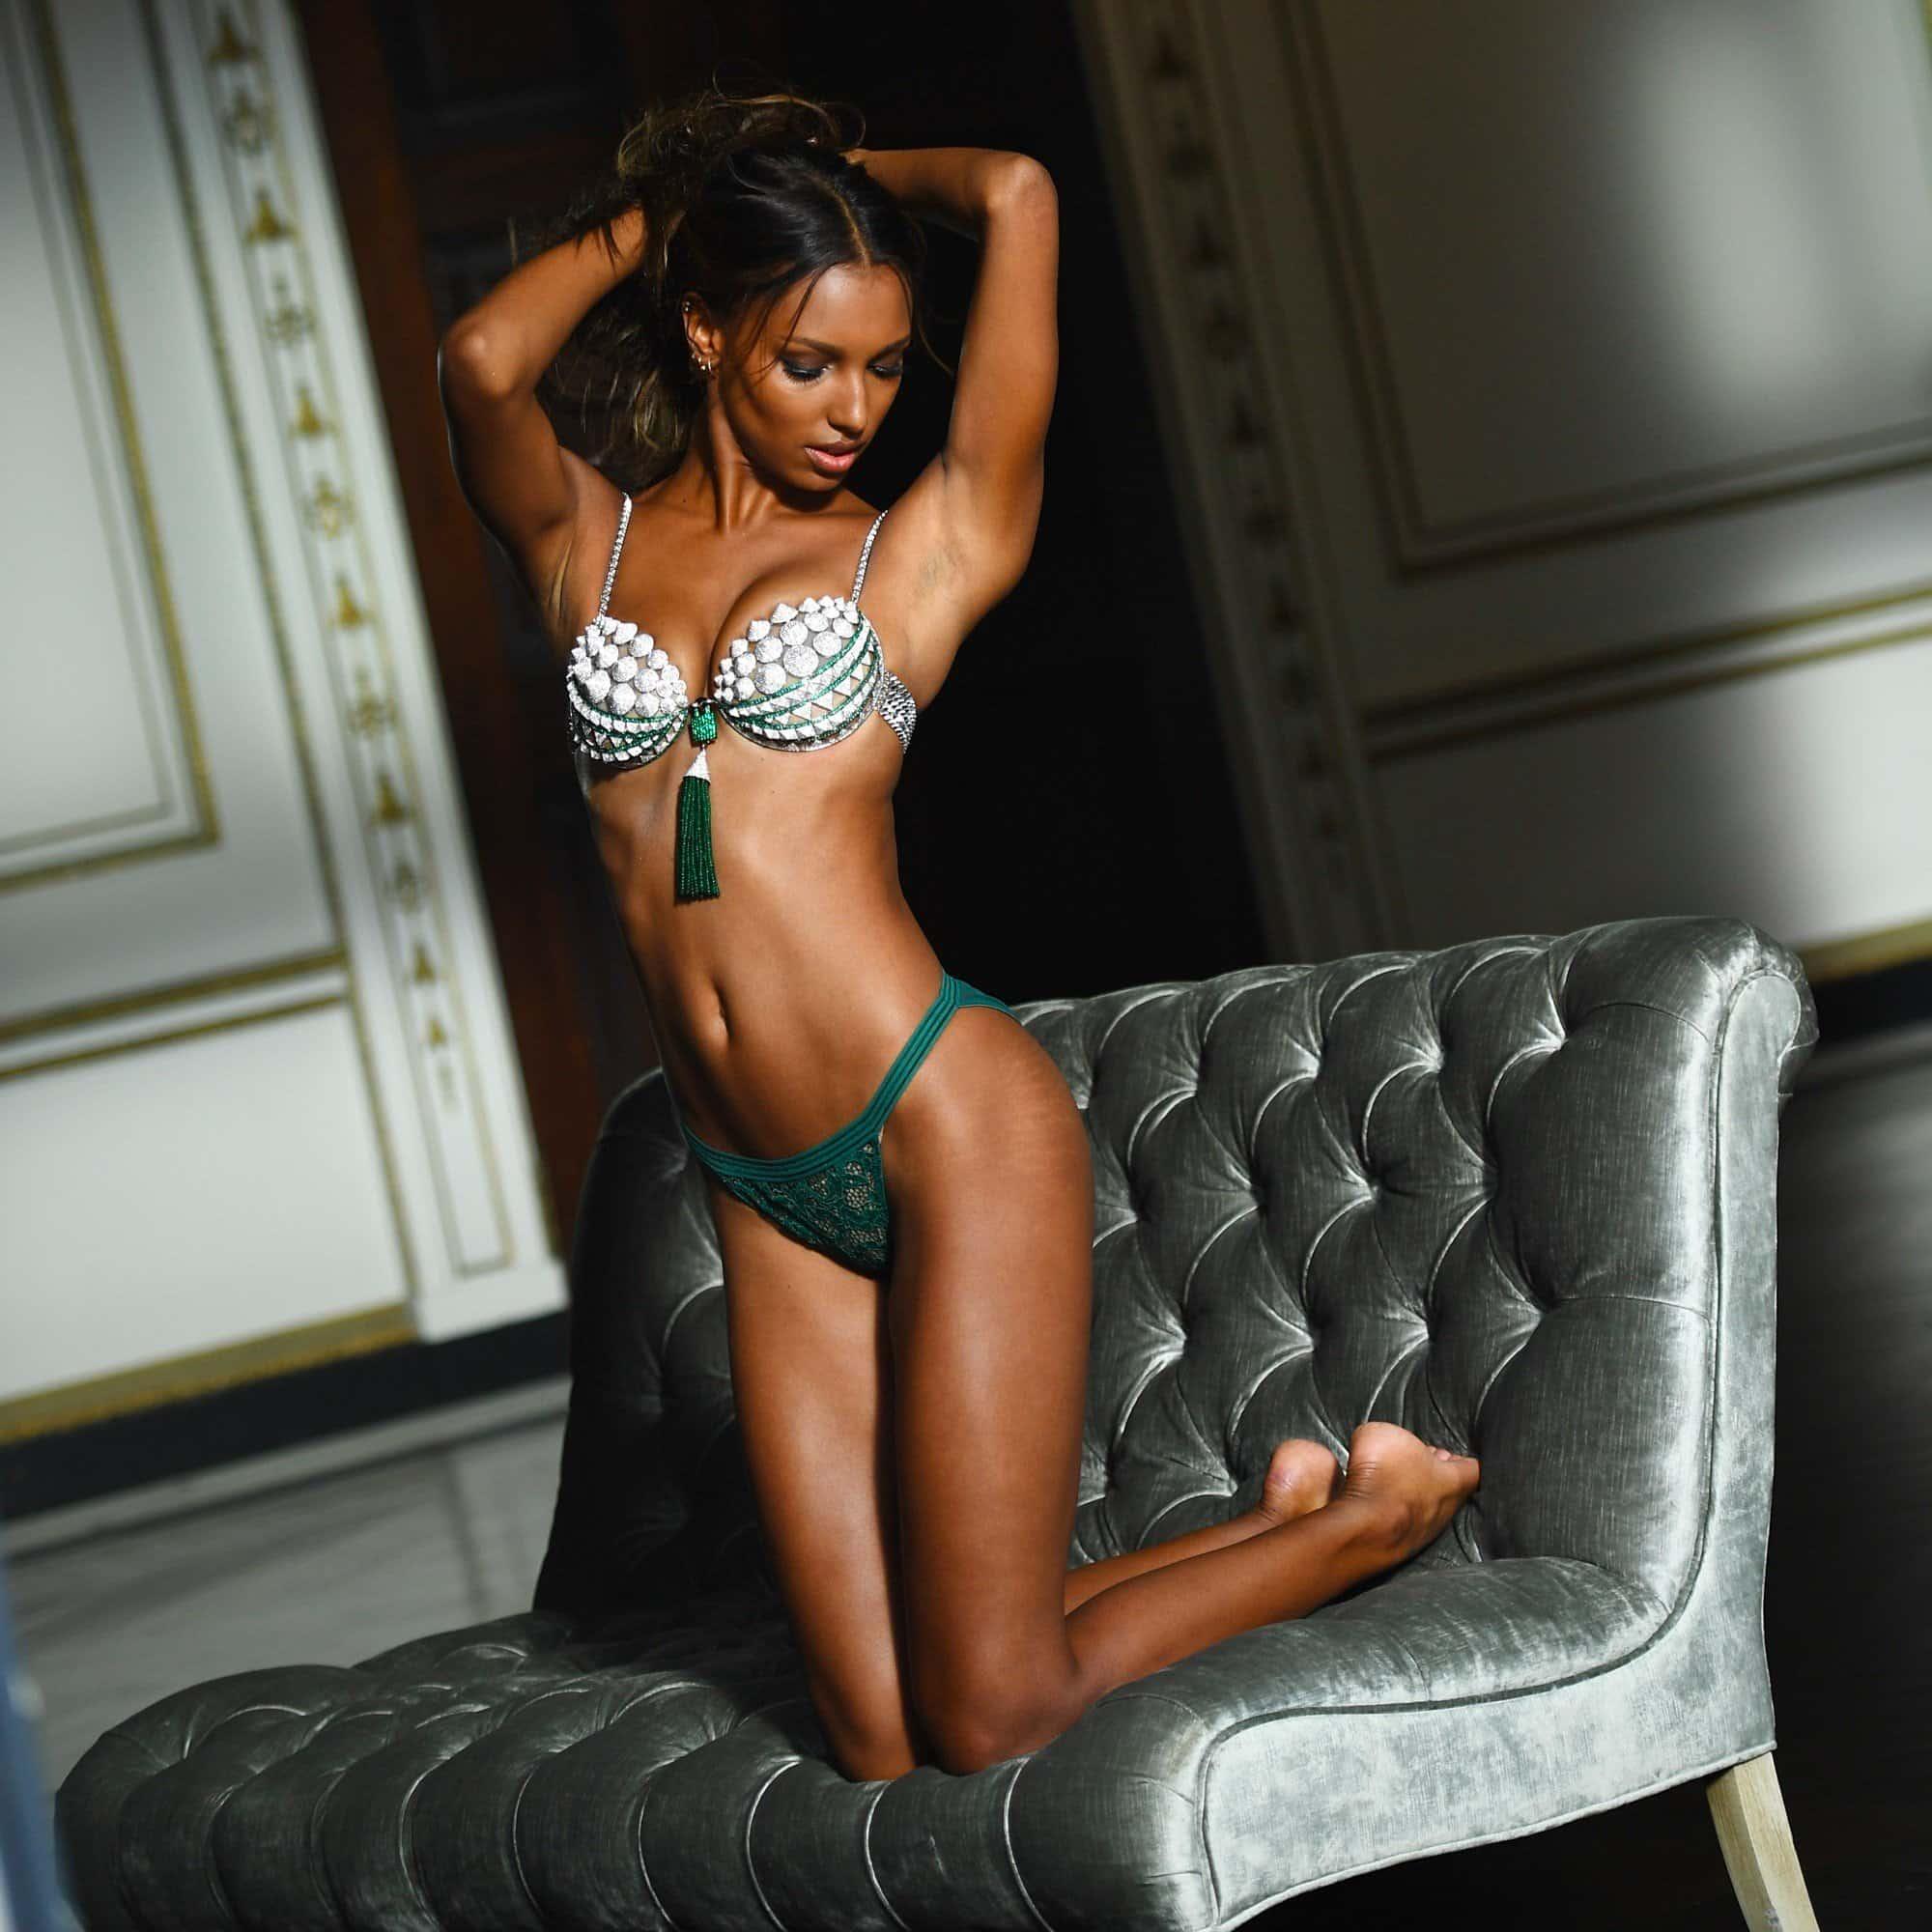 Photos-Victoria-Secret-de-Jasmine-Tooks-Avec-Vergetures TOP MODELS